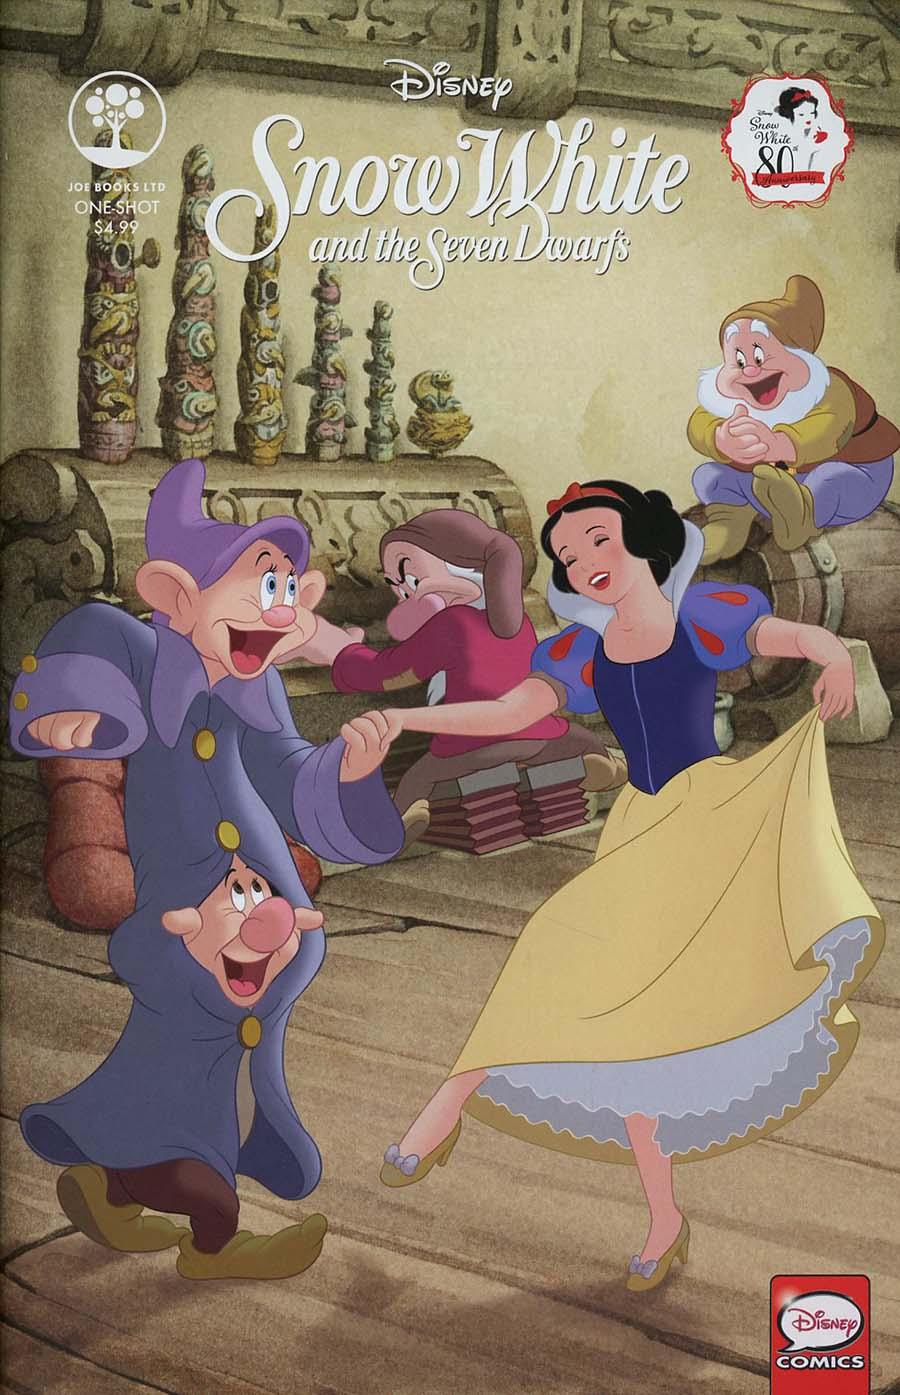 Disney Snow White And The Seven Dwarfs 80th Anniversary One Shot